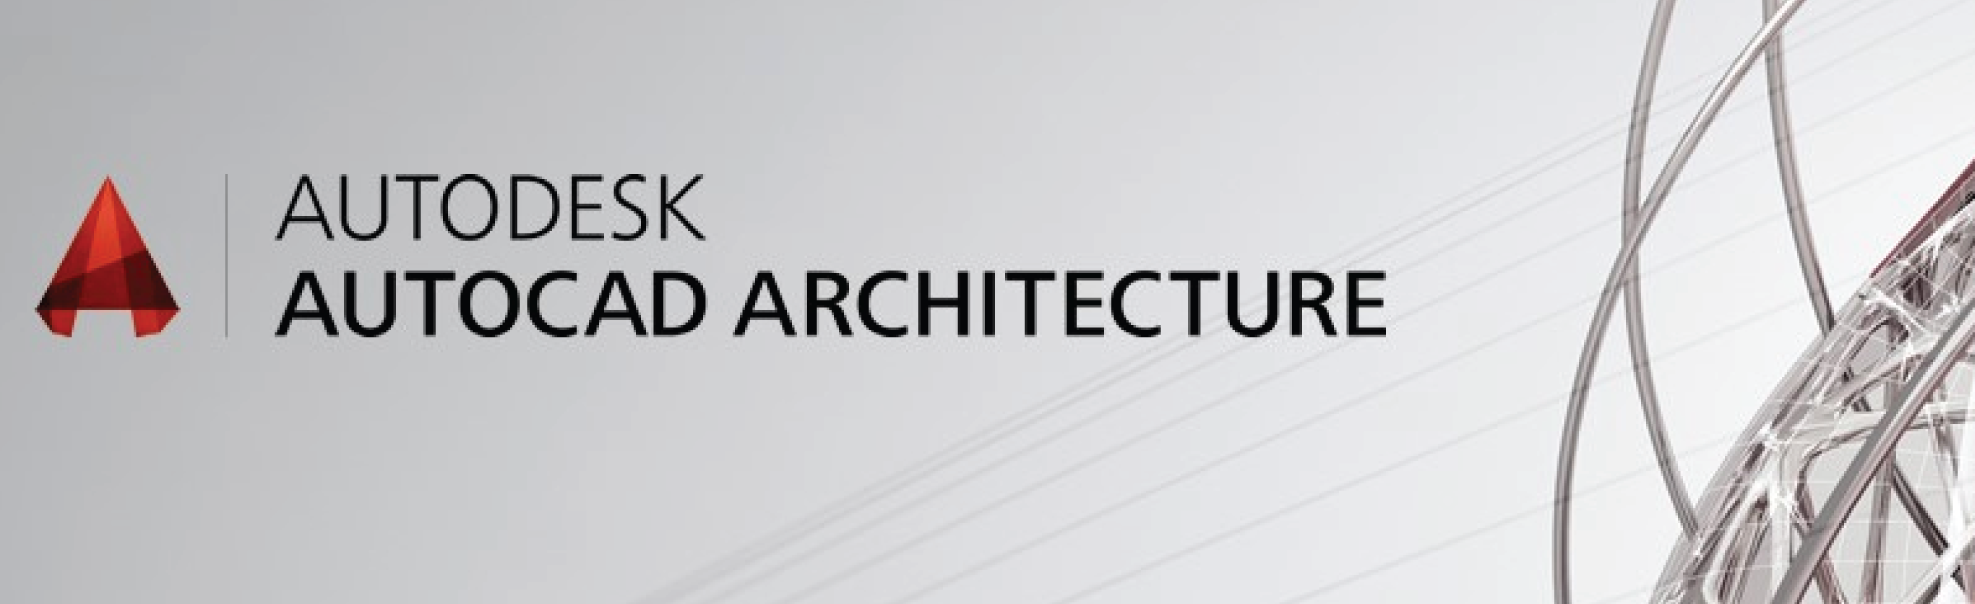 AutoCAD Architecture | Autodesk